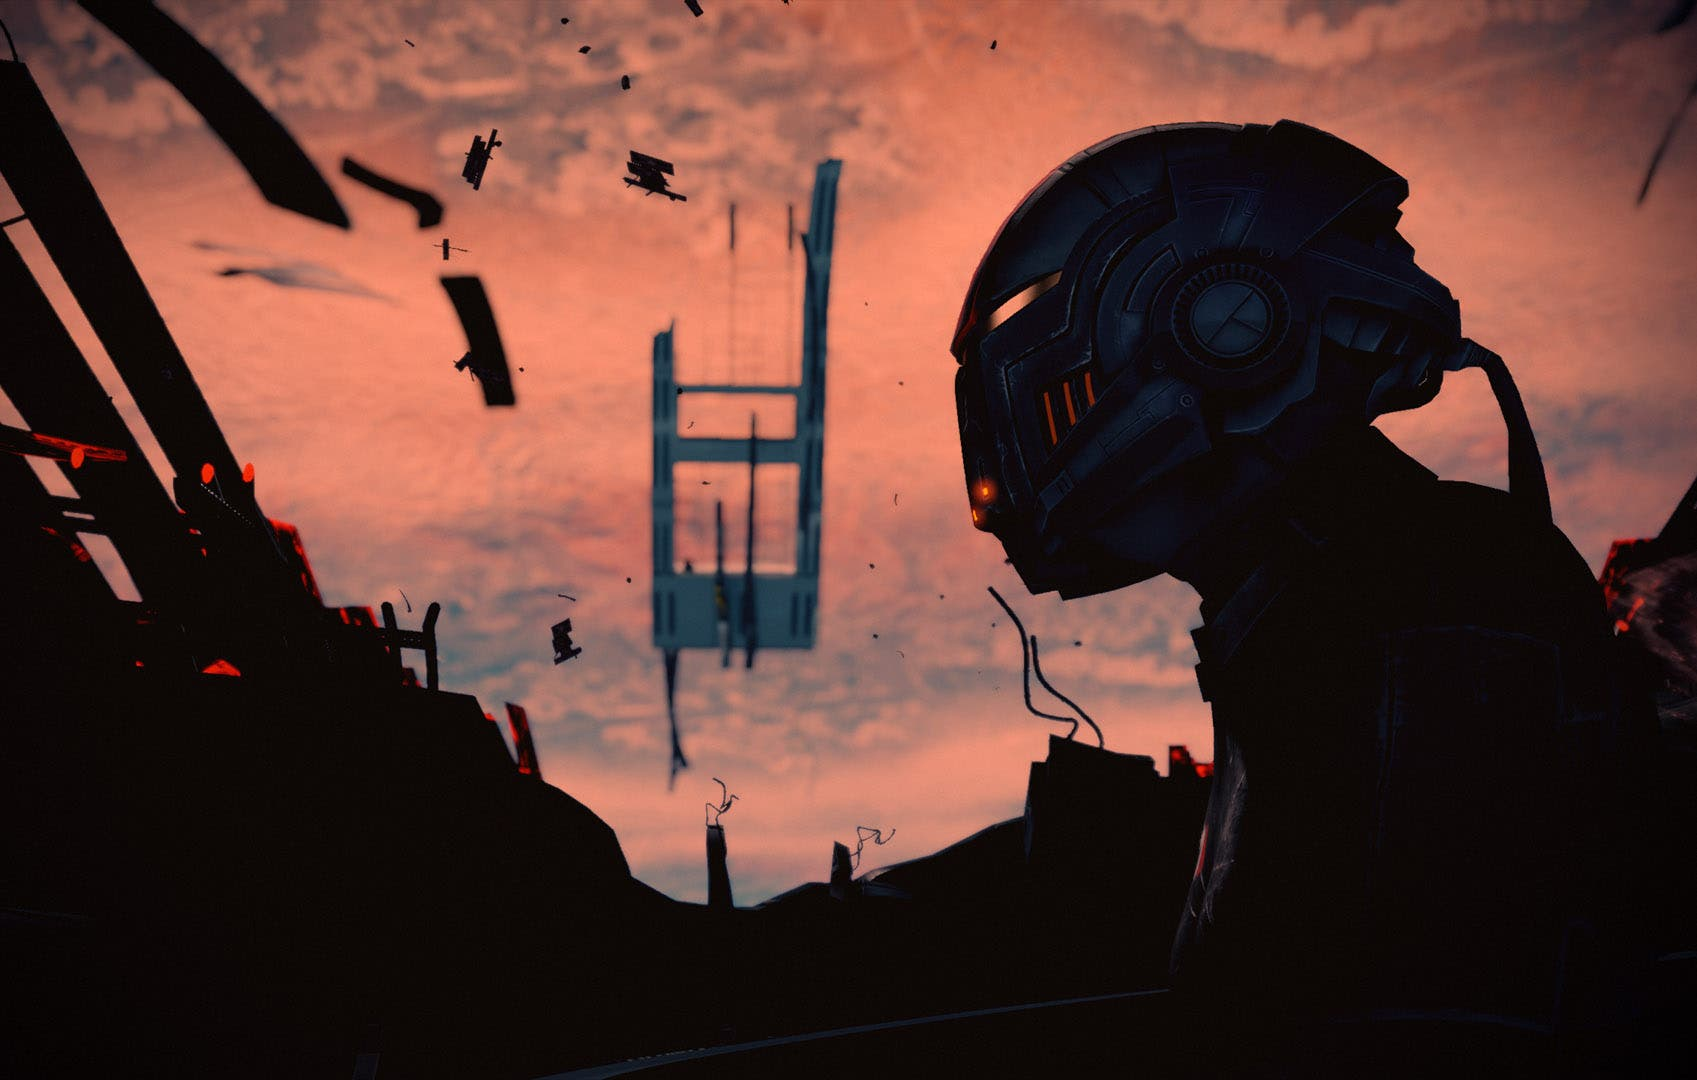 En qué orden jugar los DLCs de Mass Effect 2 en Mass Effect: Legendary Edition 7